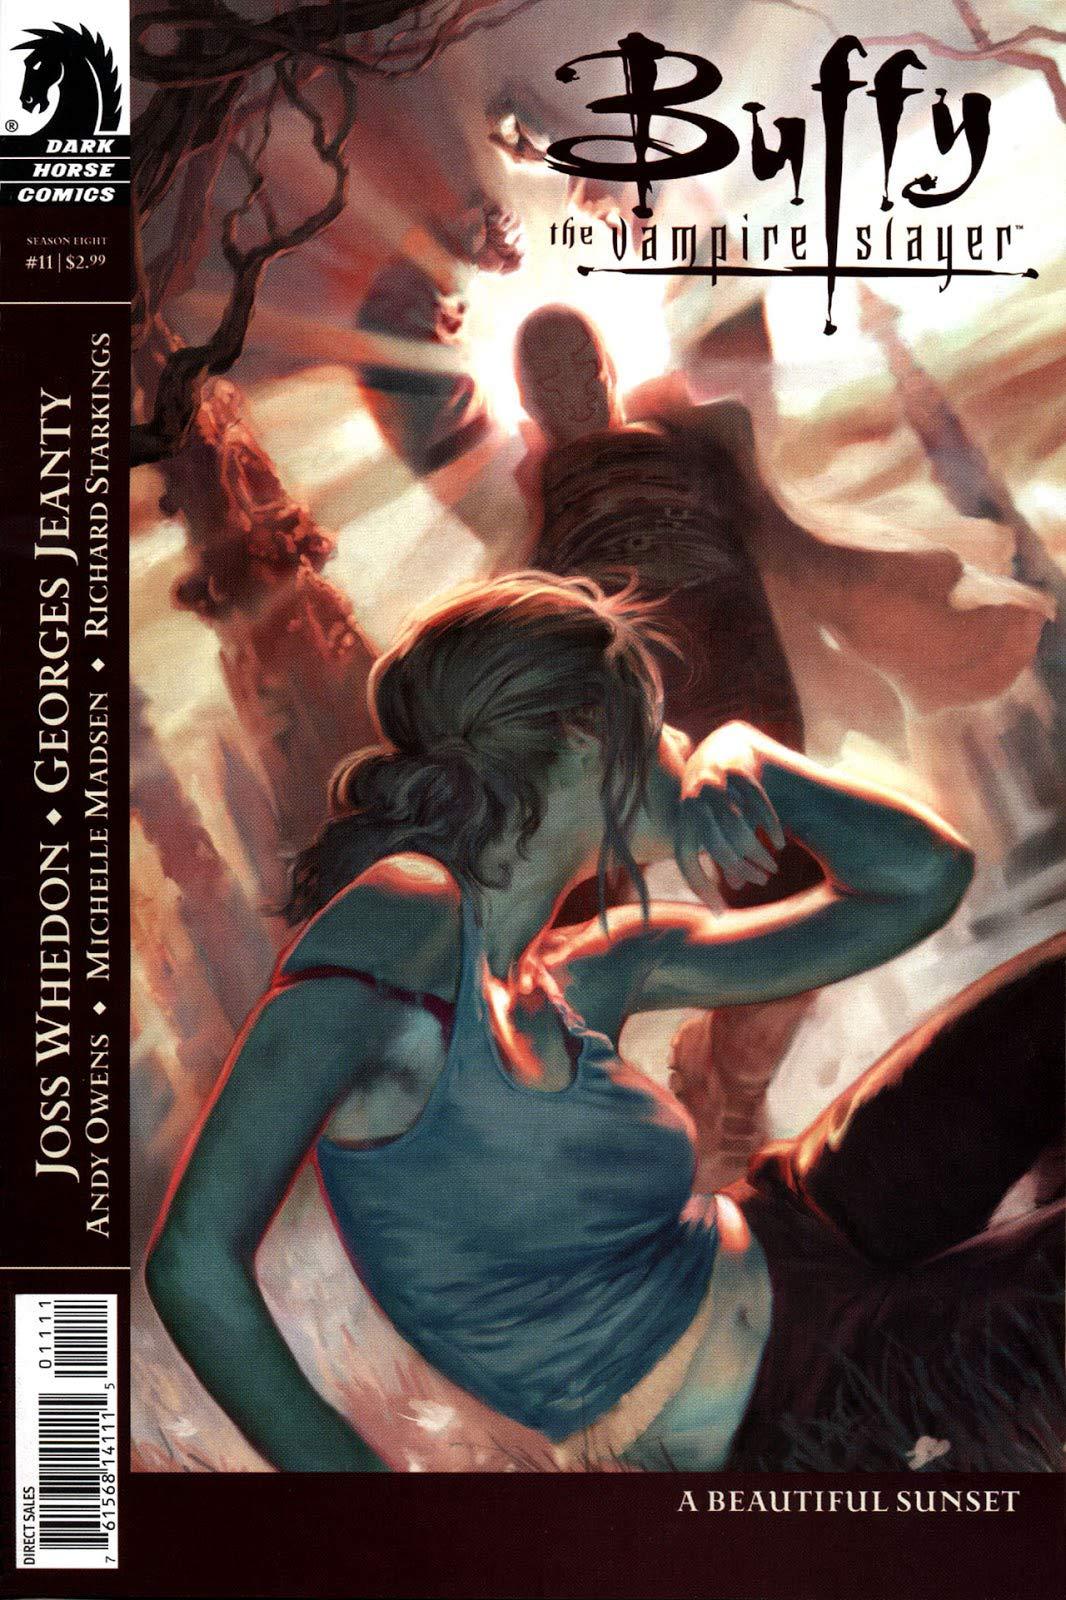 A Beautiful Sunset: Buffy the Vampire Slayer Season Eight Vol 2